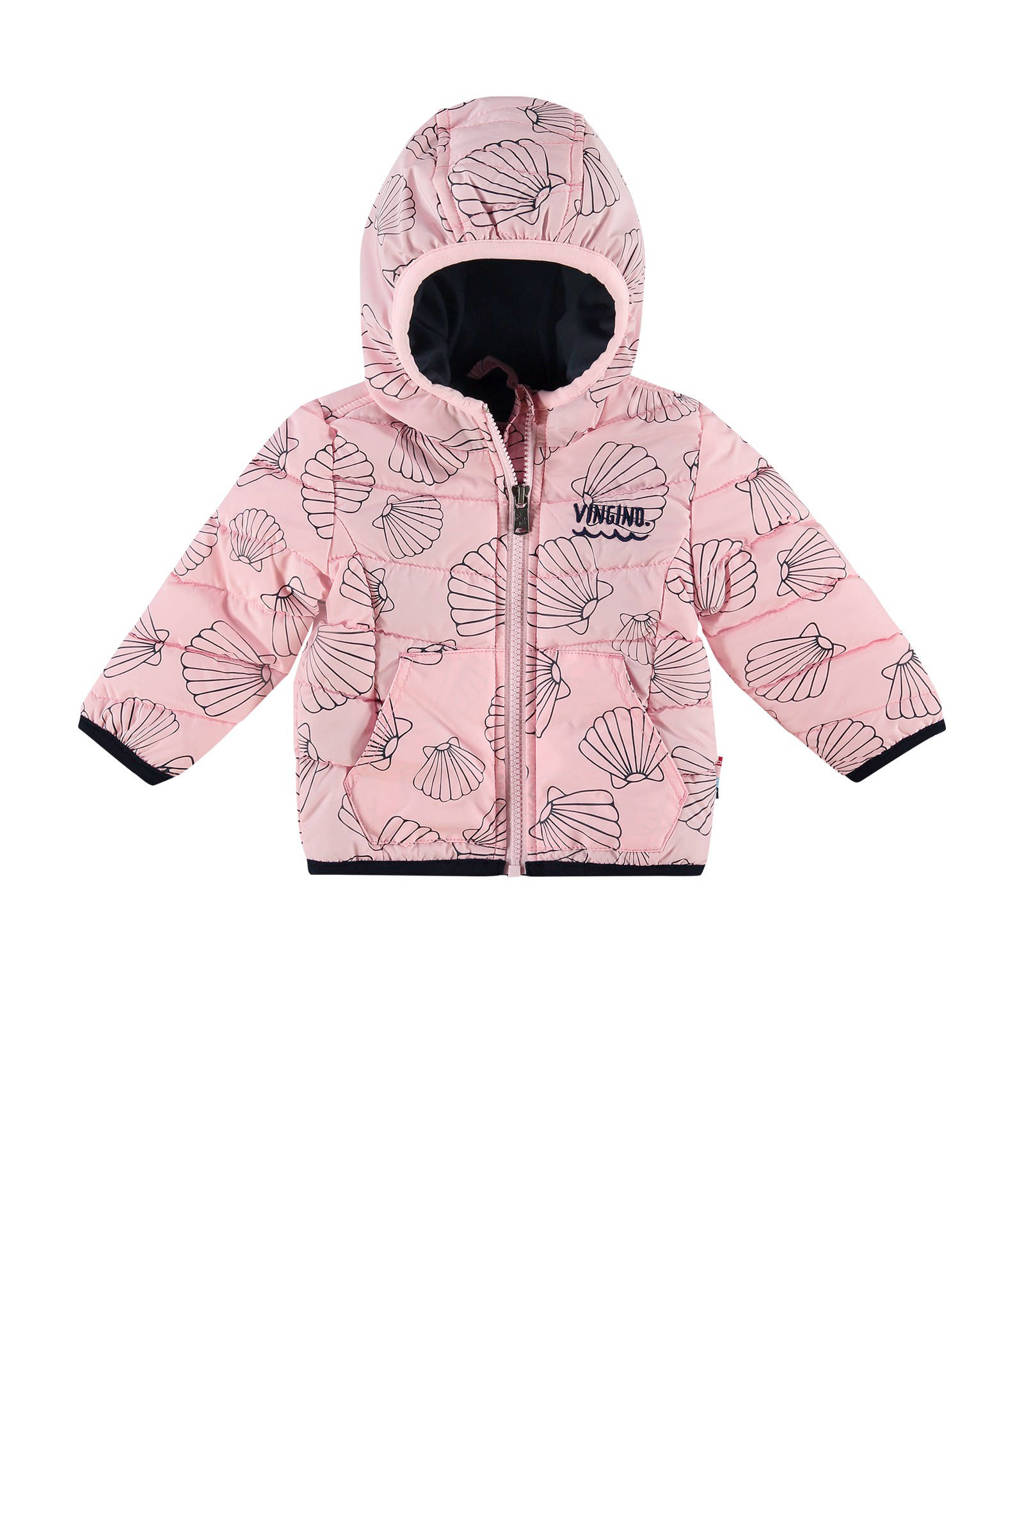 Vingino tussenjas met allover print Tedda roze, Roze/blauw